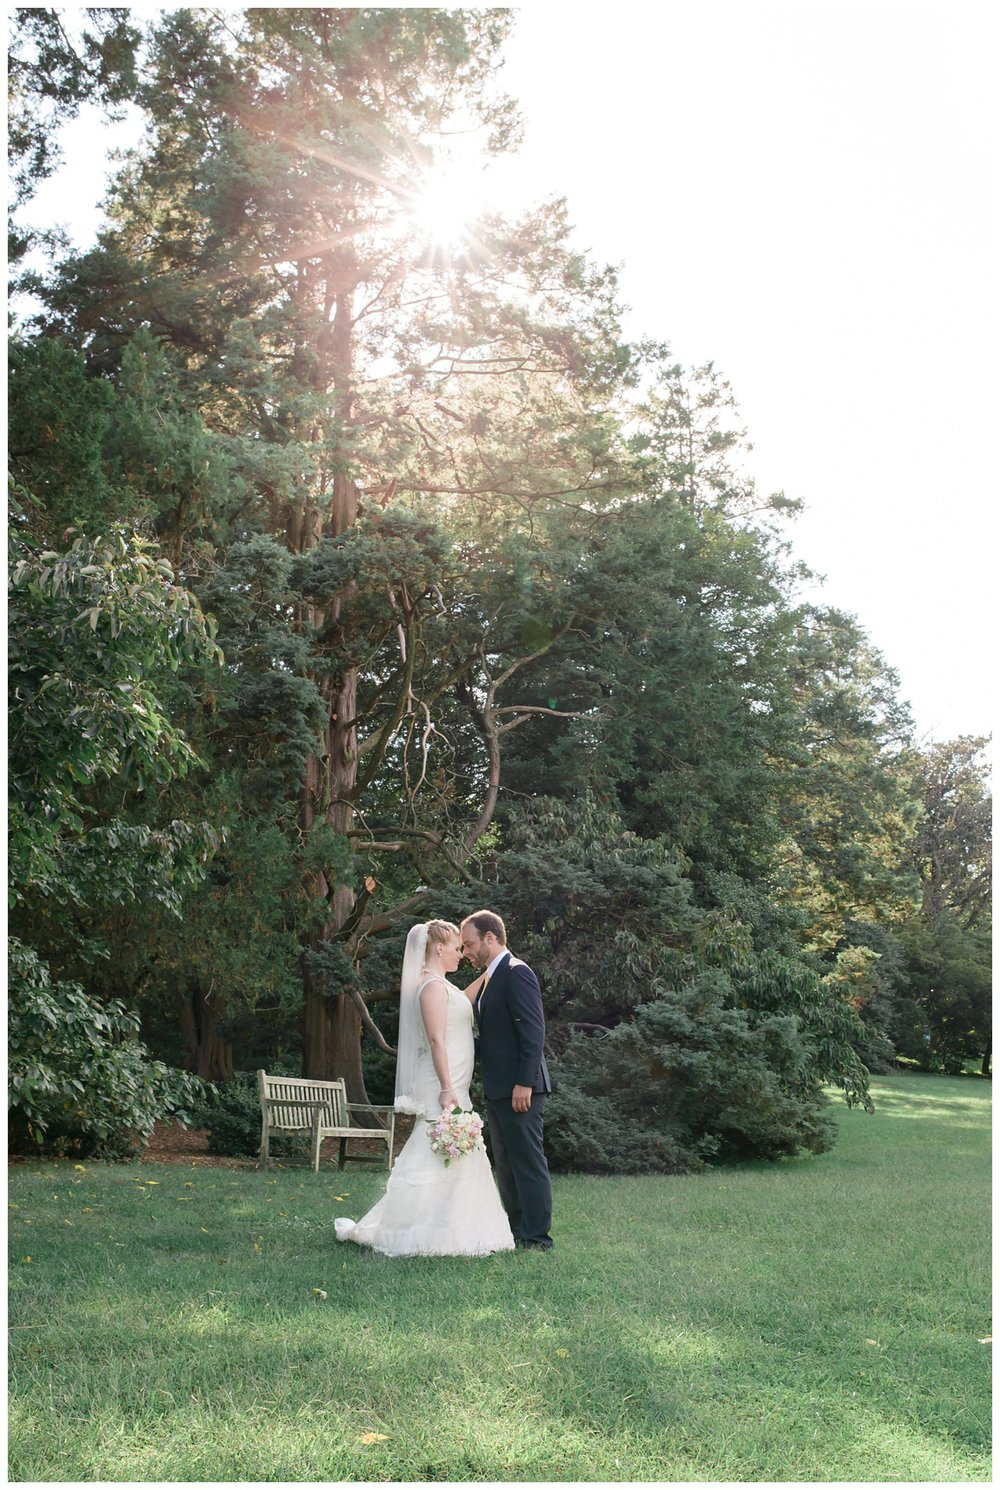 Della and Andrew Wedding Photos_Hendry House Arlington Virginia_Stephanie Kopf Photography_Northern Virginia Wedding Photography-102.jpg